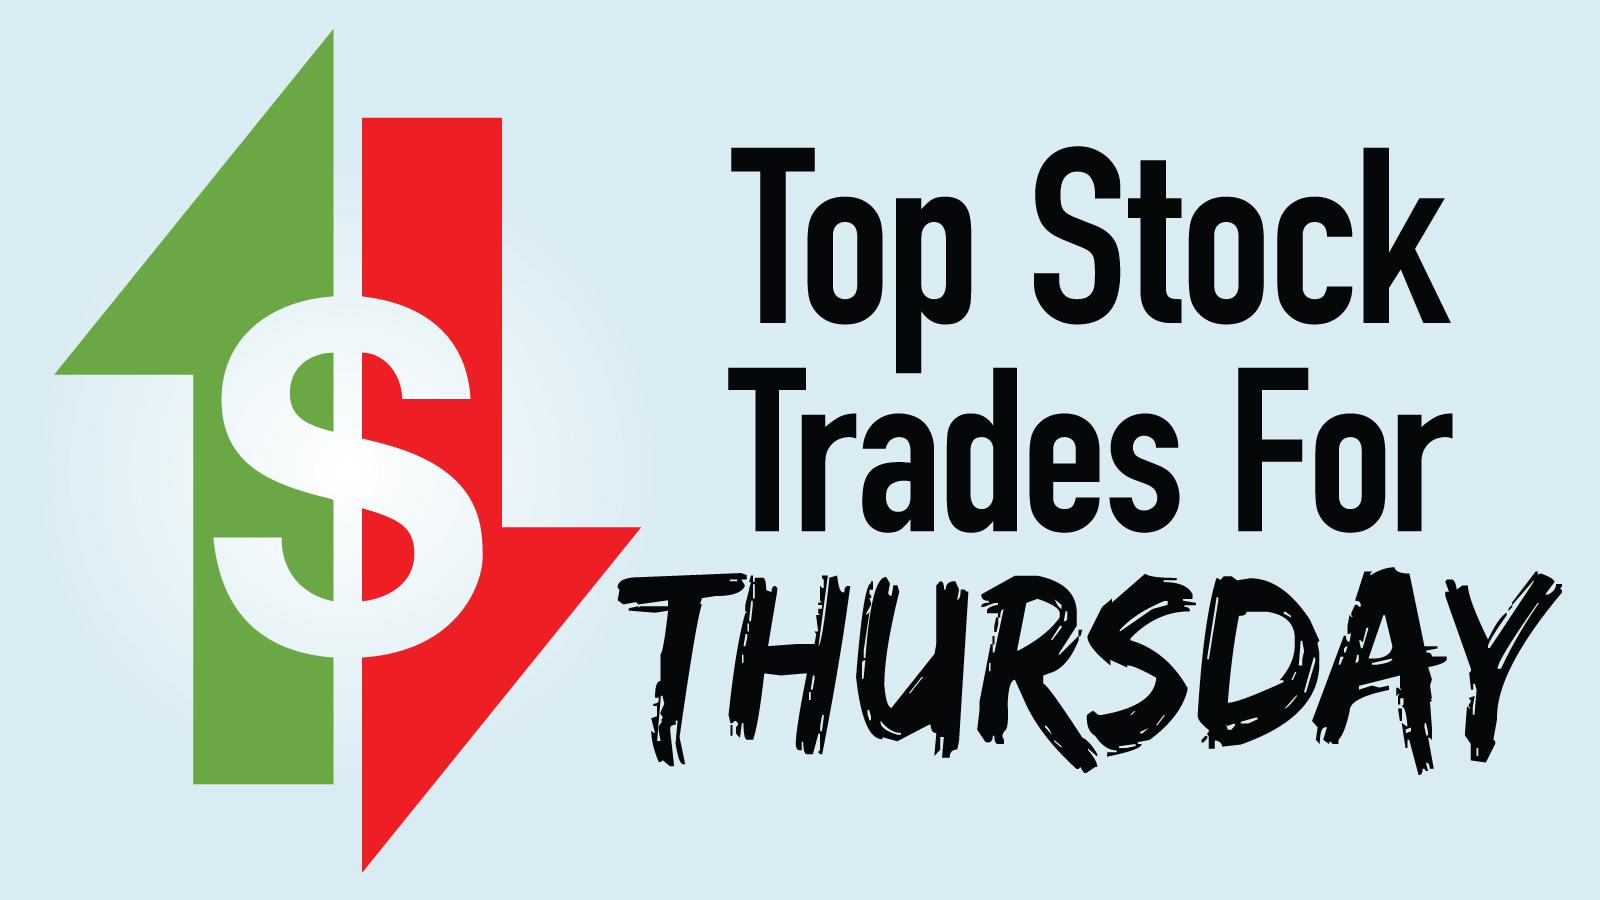 Top stock trades - 4 Top Stock Trades for Thursday: Ethereum, MSFT, BA, MVIS